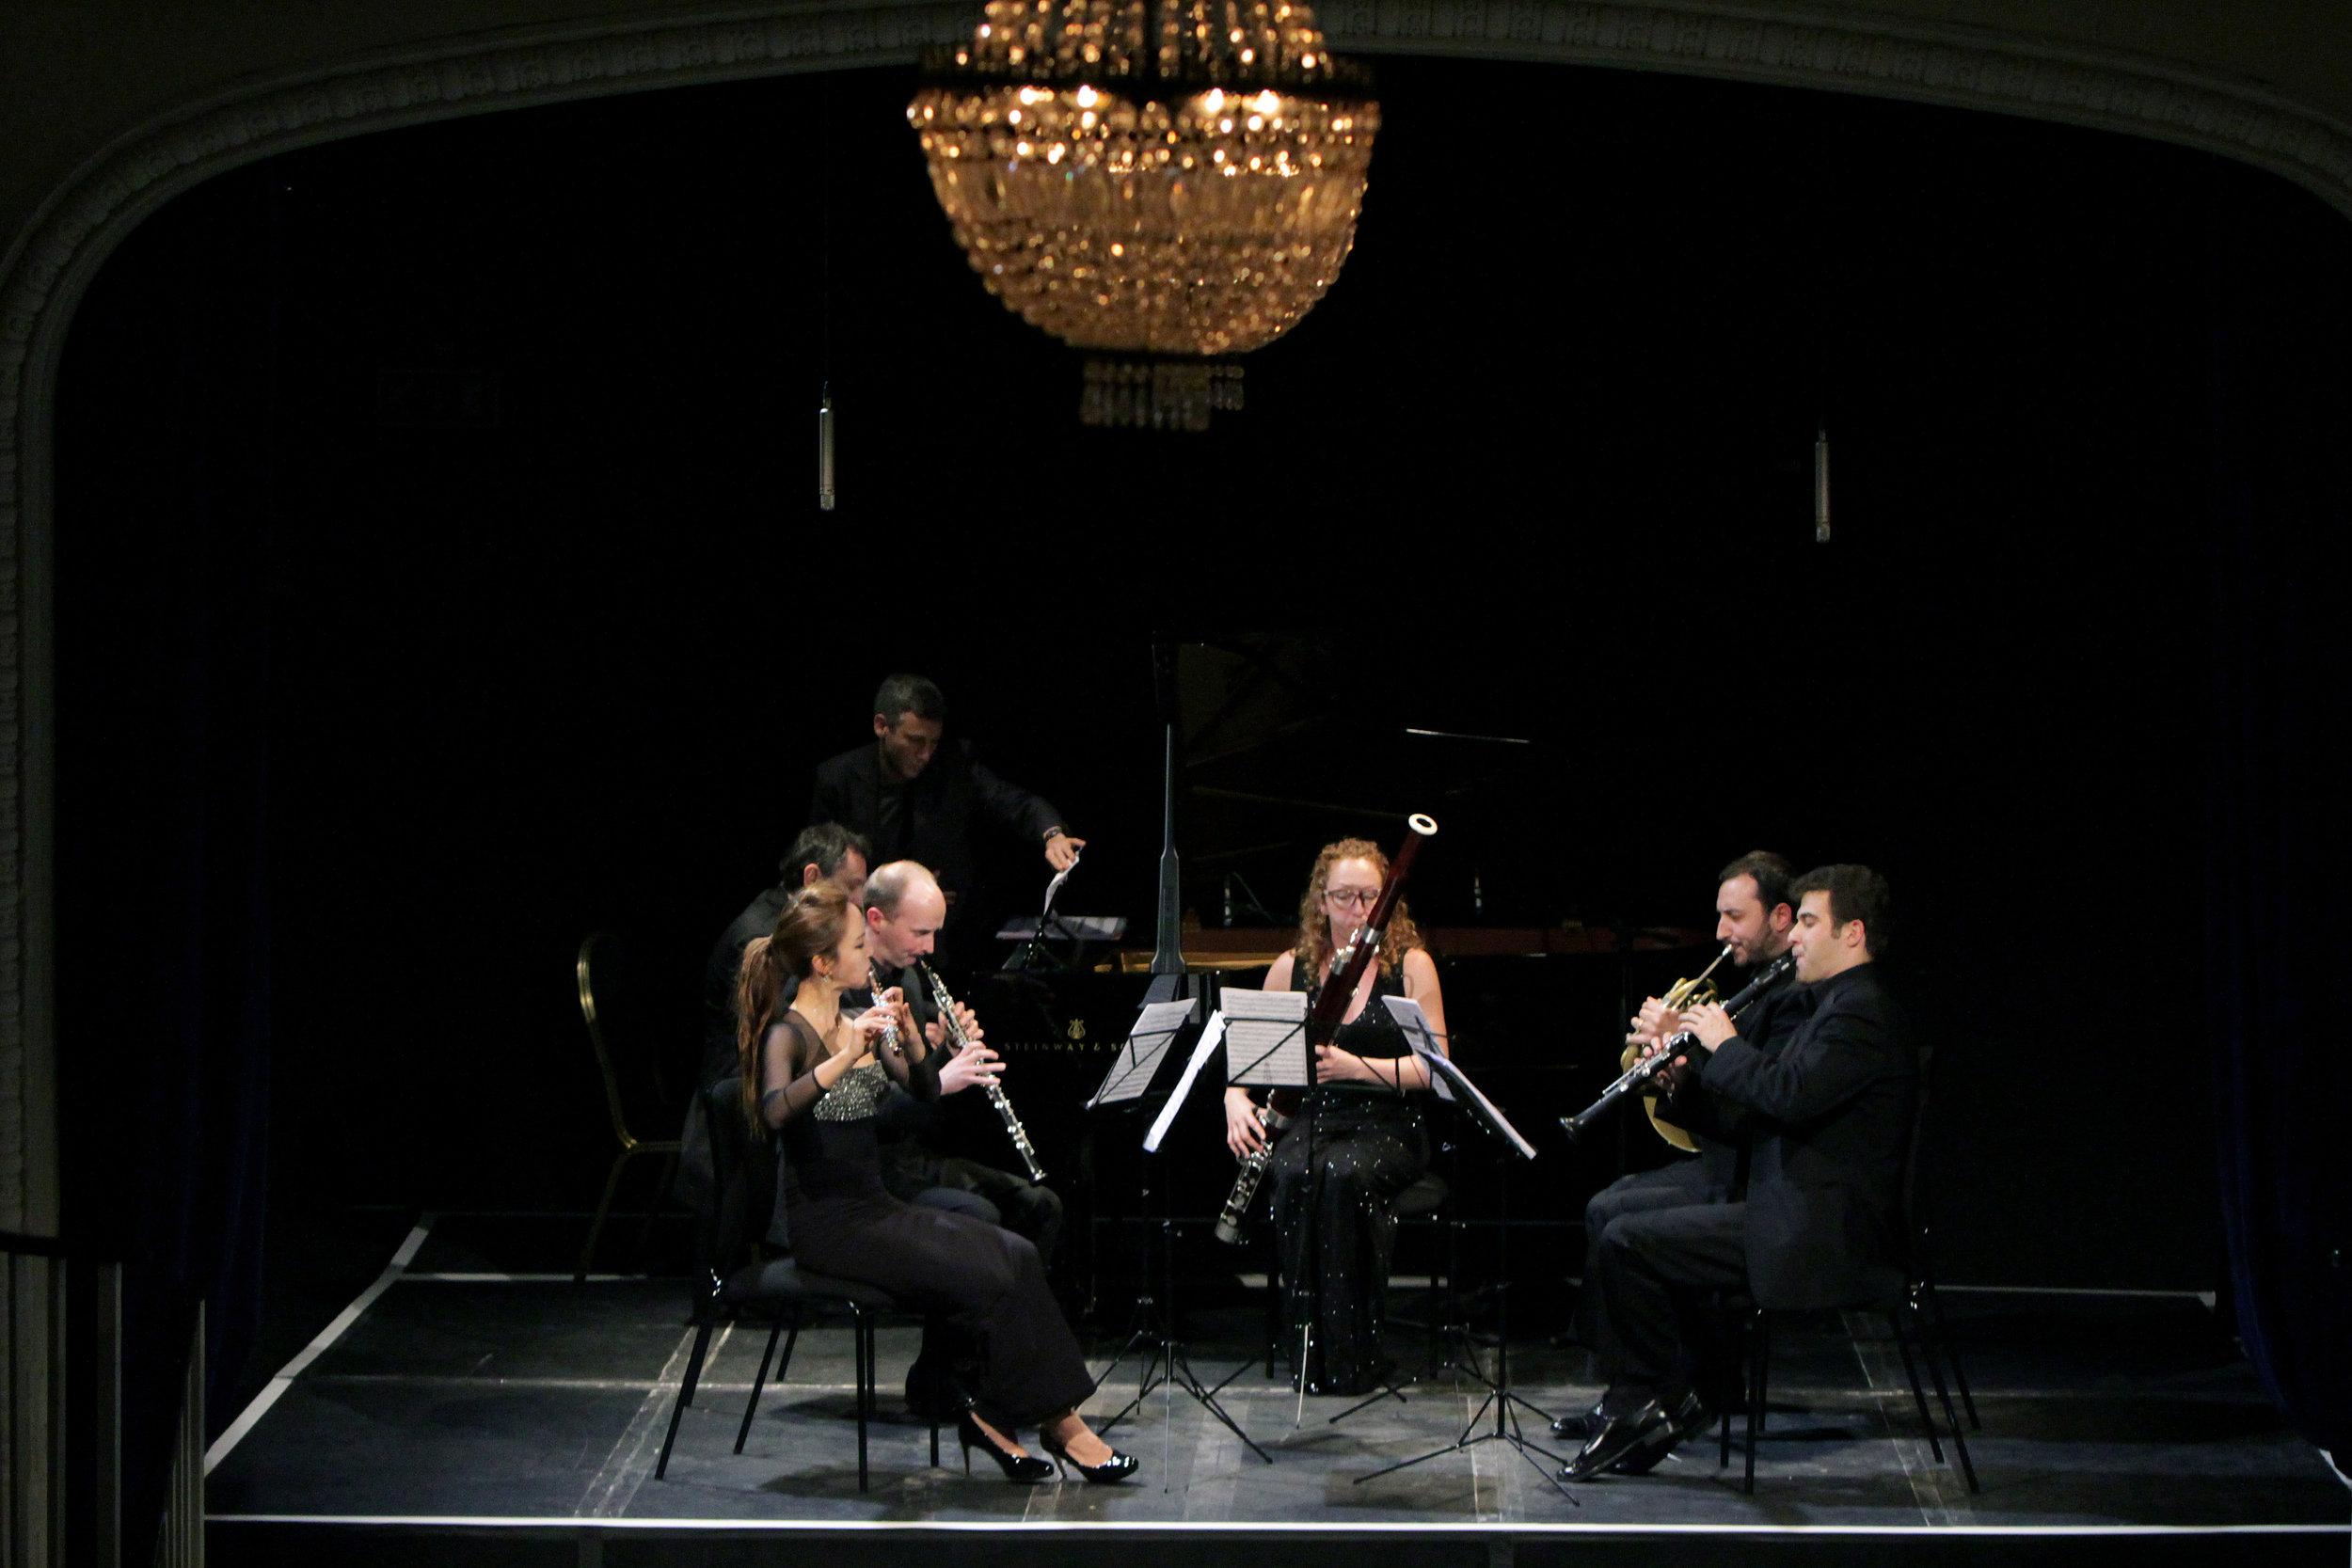 WINDS OF CHANGE: VIENNA, ST. PETERSBURG, PARIS - March 26, 2015. londonVsevolod Dvorkin, pianoJasmine Choi, fluteAlexander Bedenko, clarinetTimothy Rundle, oboeLaura Vincent, bassoonGeremia Iezzi, hornIllustrated talk by Richard WigmoreMozart - Quintet in E flat major for piano and winds, K452Rimsky-Korsakov - Quintet in B flat majorPoulenc - Sextet for piano and wind quintet, Op. 100